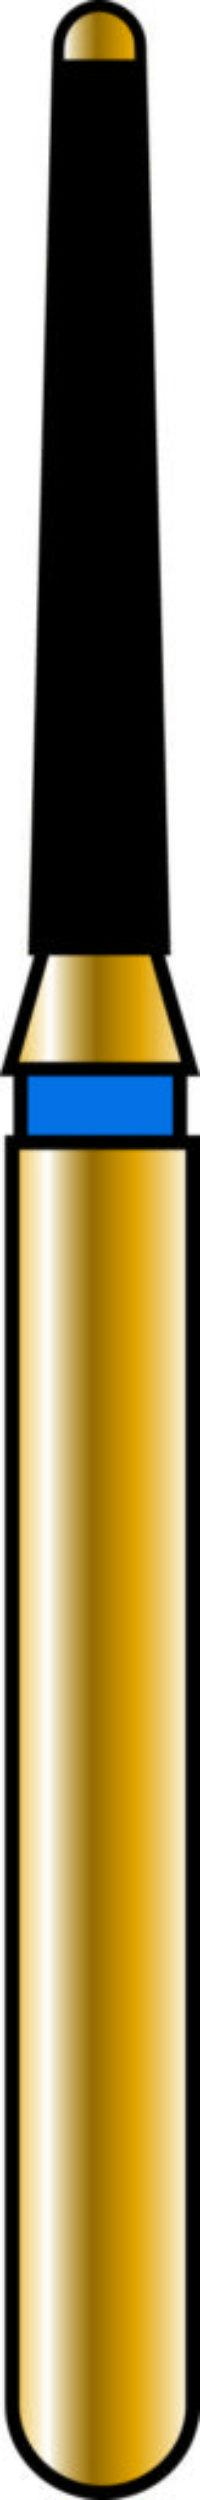 Safe End Rounded Taper 12-8mm Gold Diamond Bur - Coarse Grit